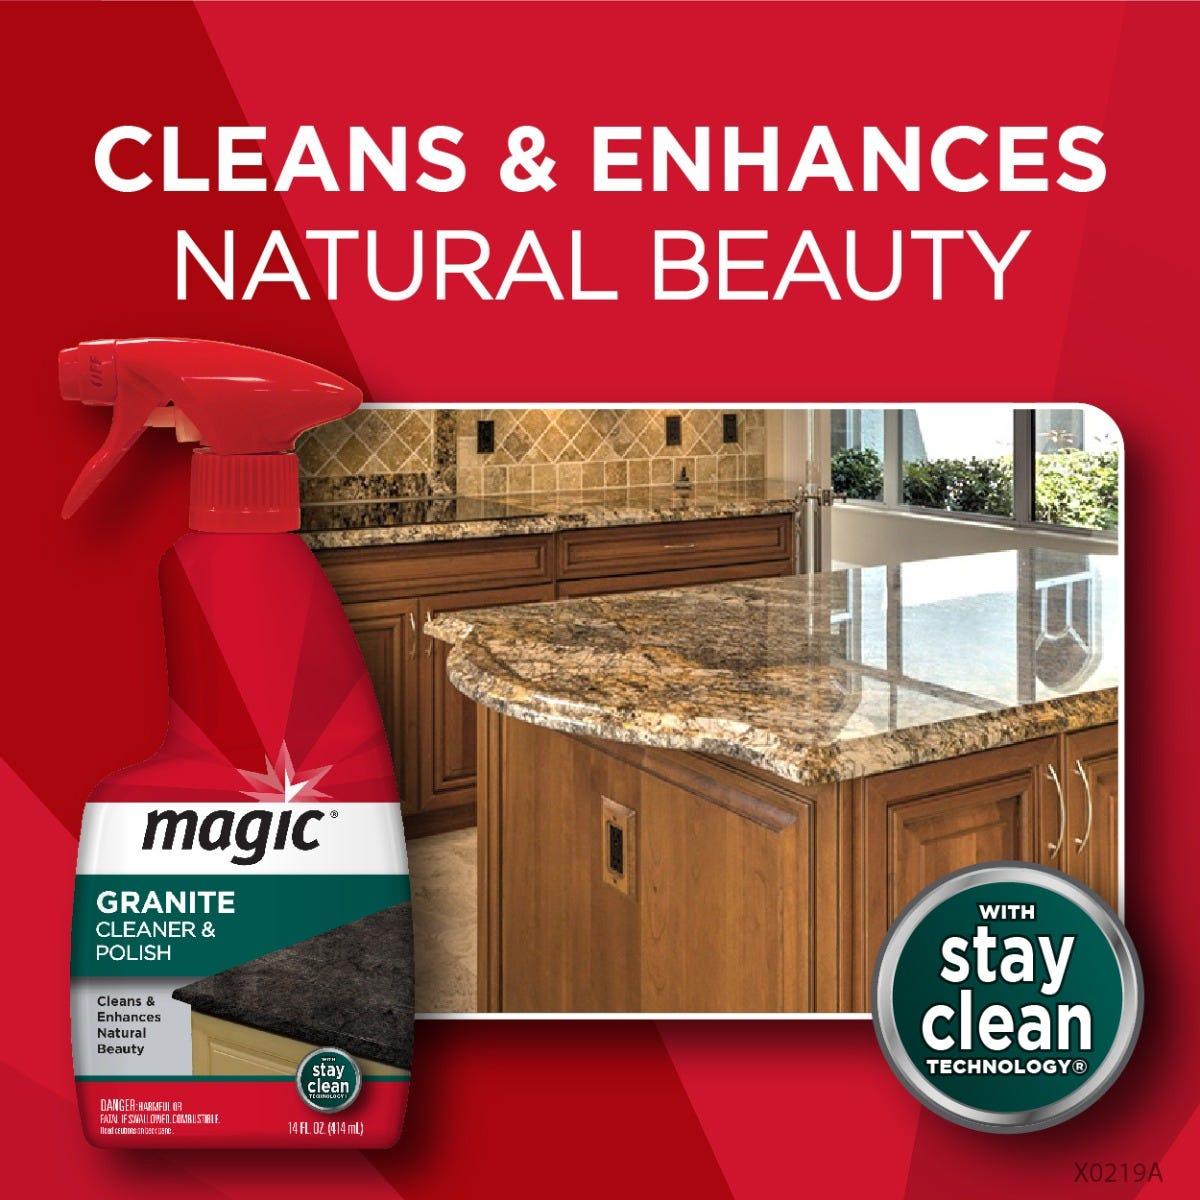 https://googone.com/media/catalog/product/m/a/magic_granite_cleaner_beauty_2.jpg